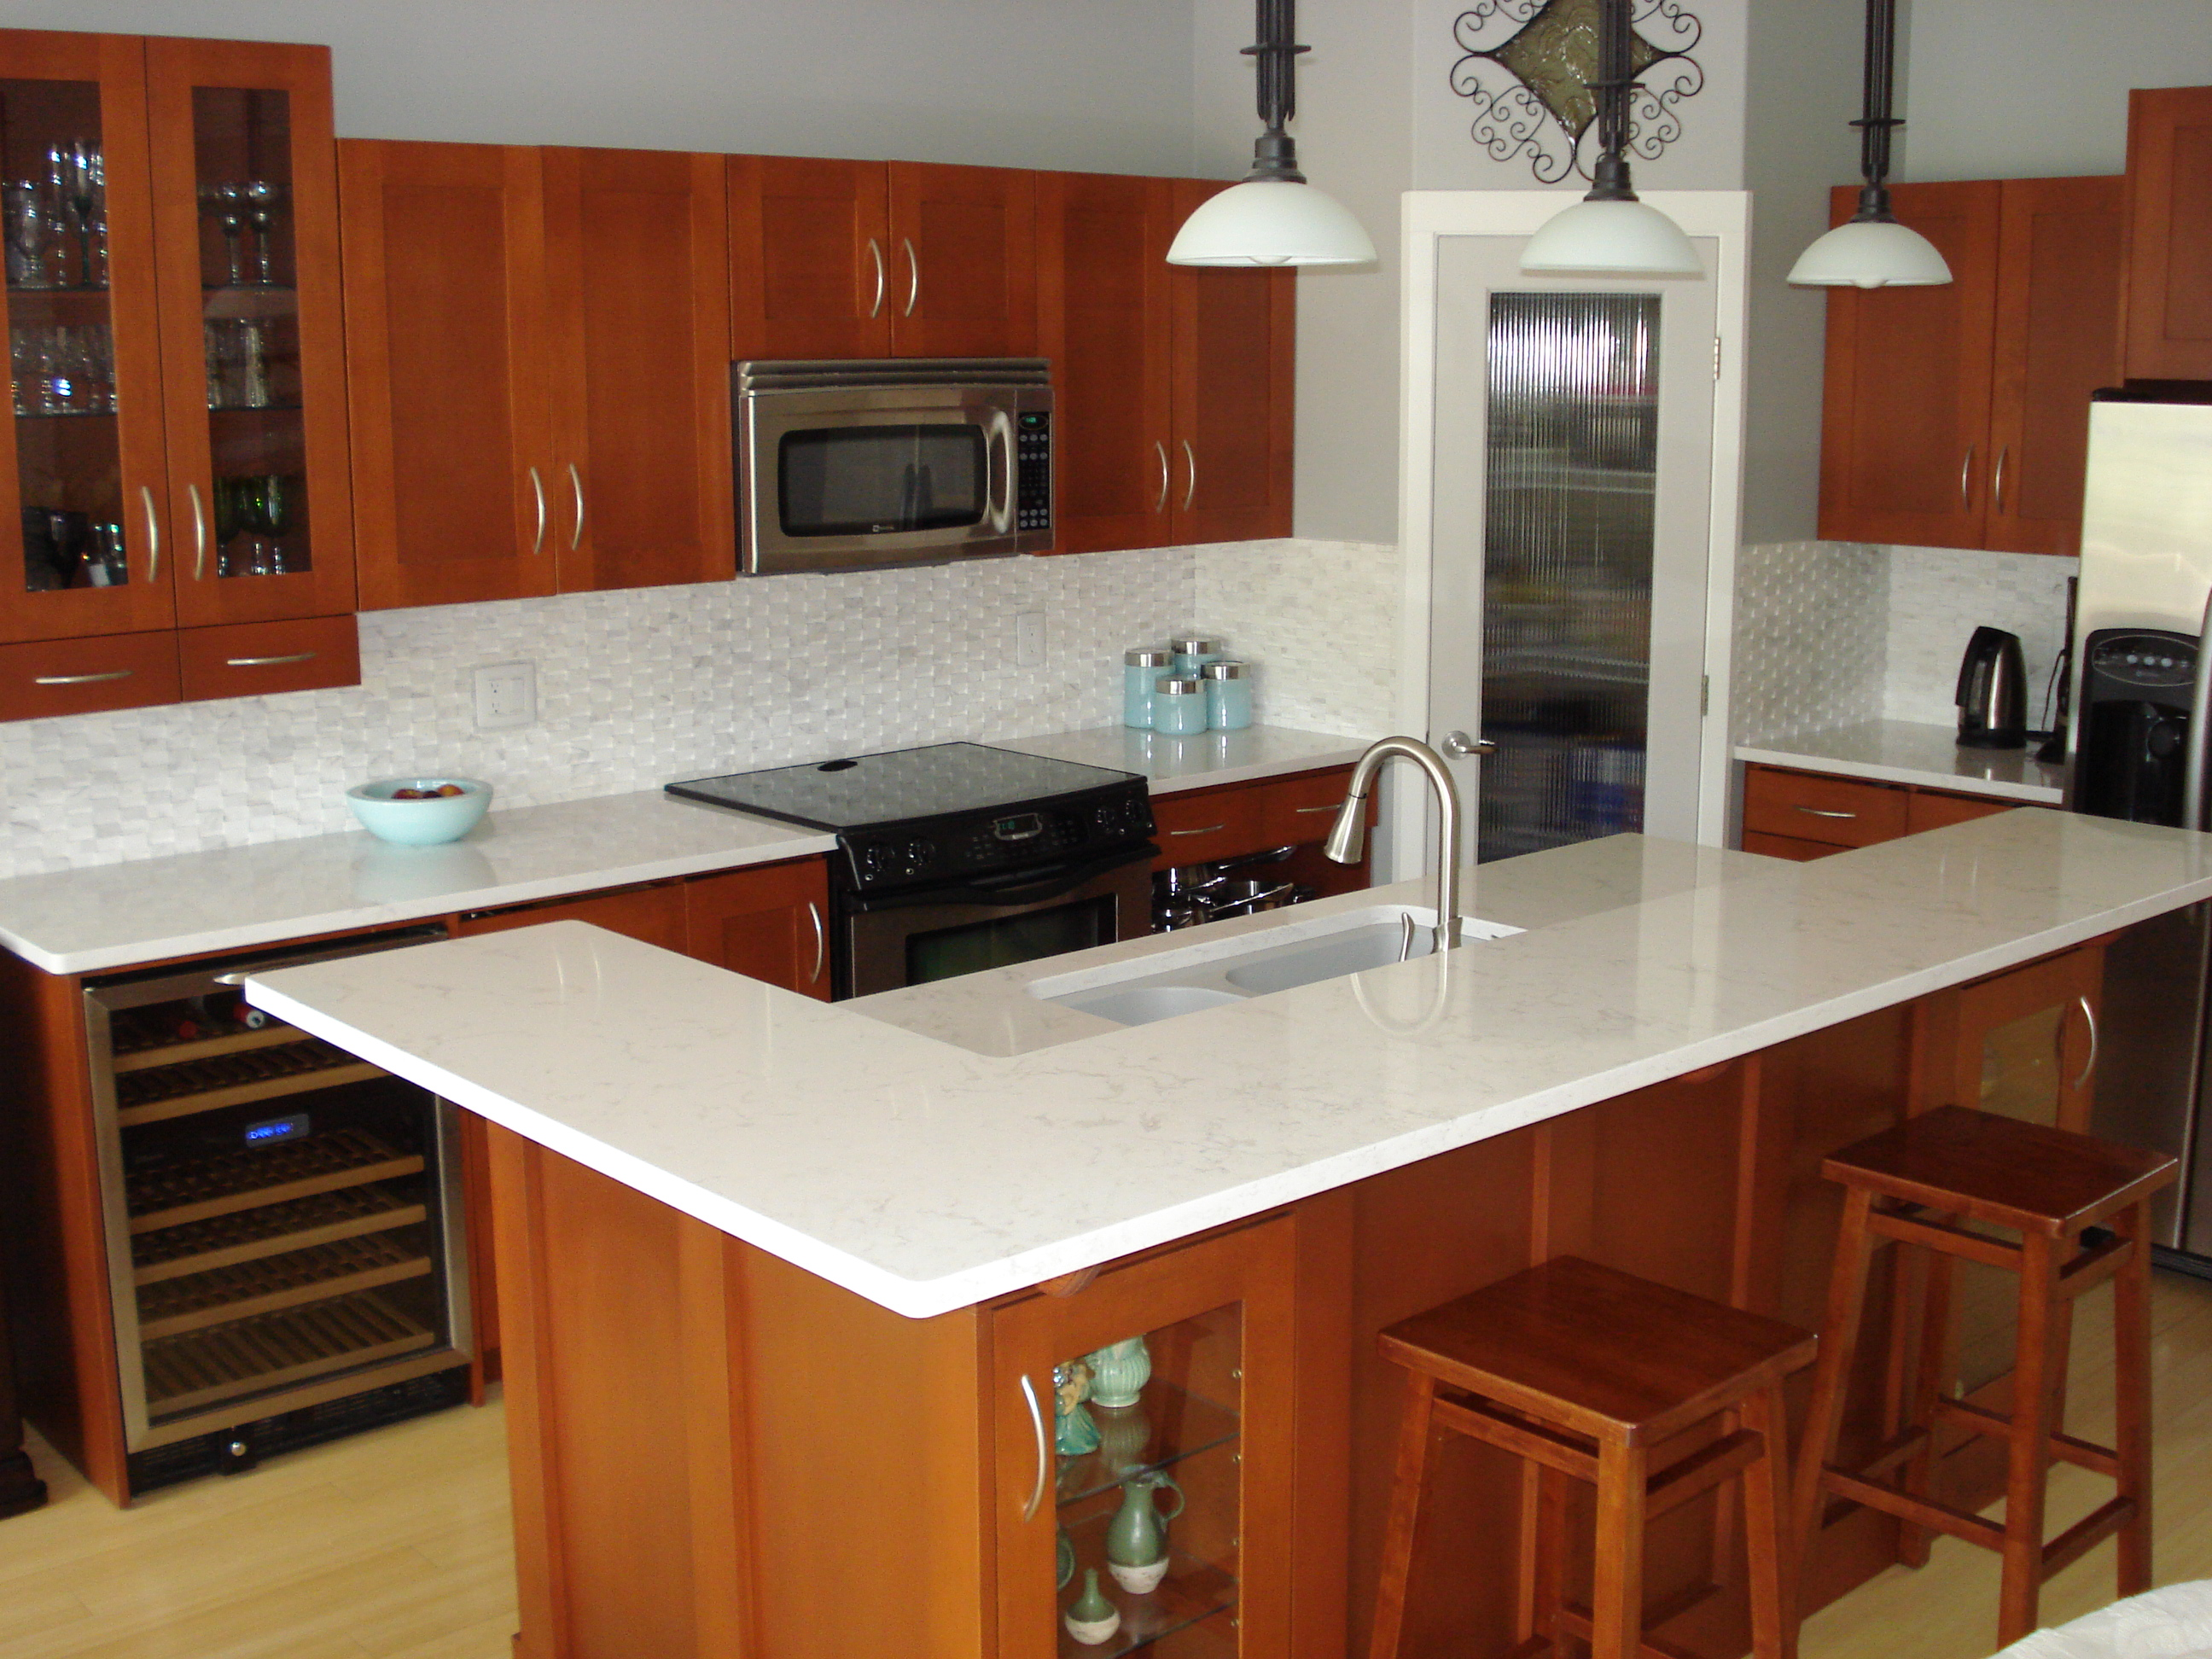 quartz countertops madeira stone penticton kelowna 2 quartz kitchen countertops Gorgeous White Quartz Countertops Make a Statement in this Okanagan Kitchen